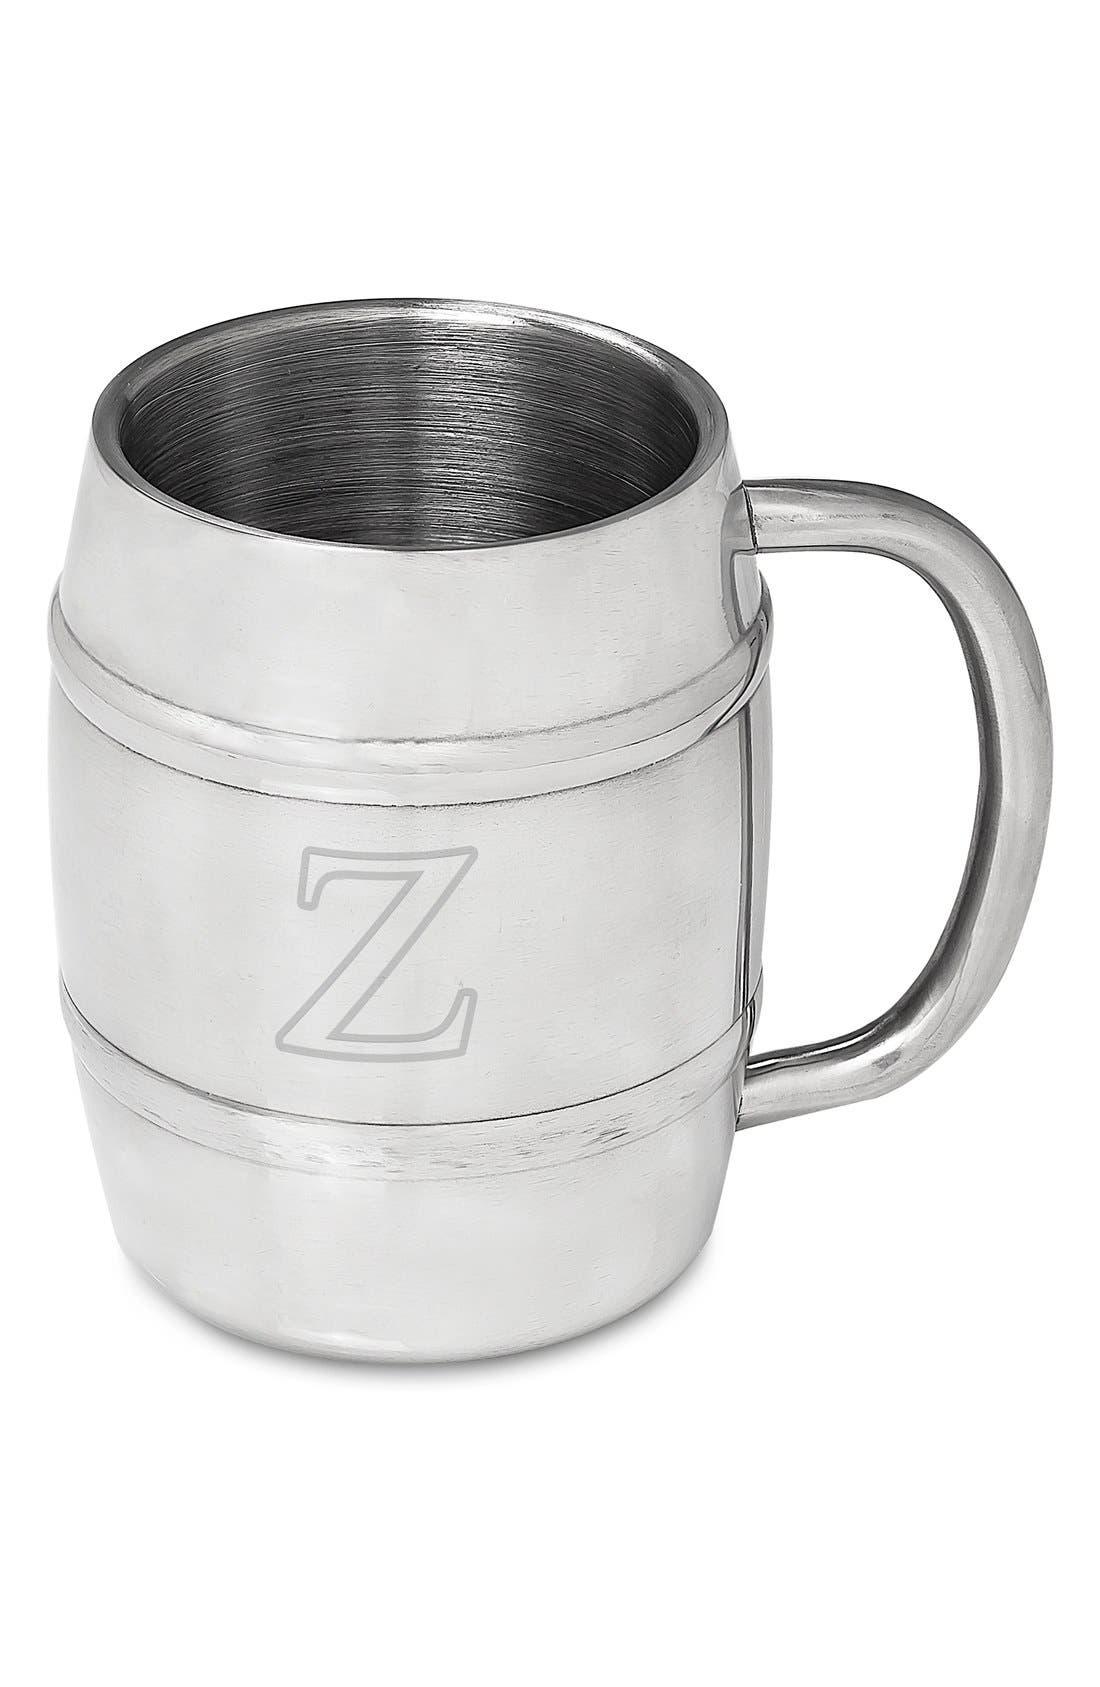 Monogram Stainless Steel Keg Mug,                             Main thumbnail 27, color,